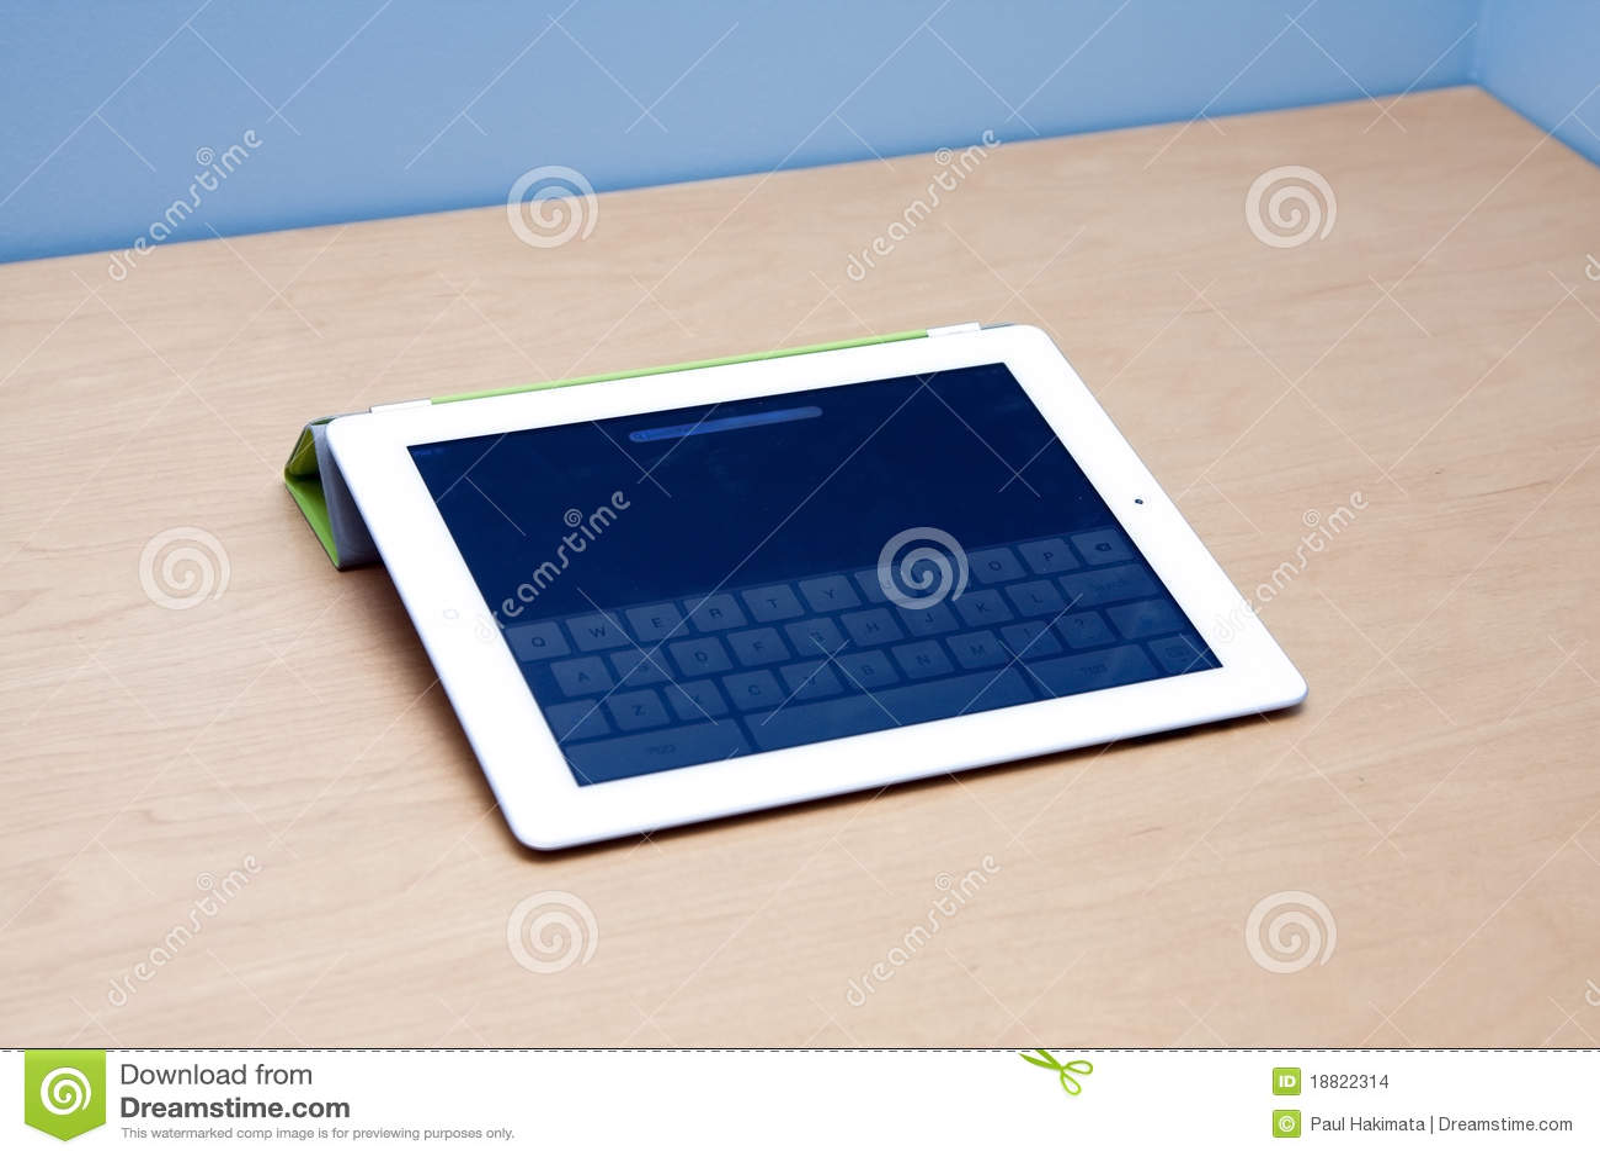 Rencontre cam avec ipad